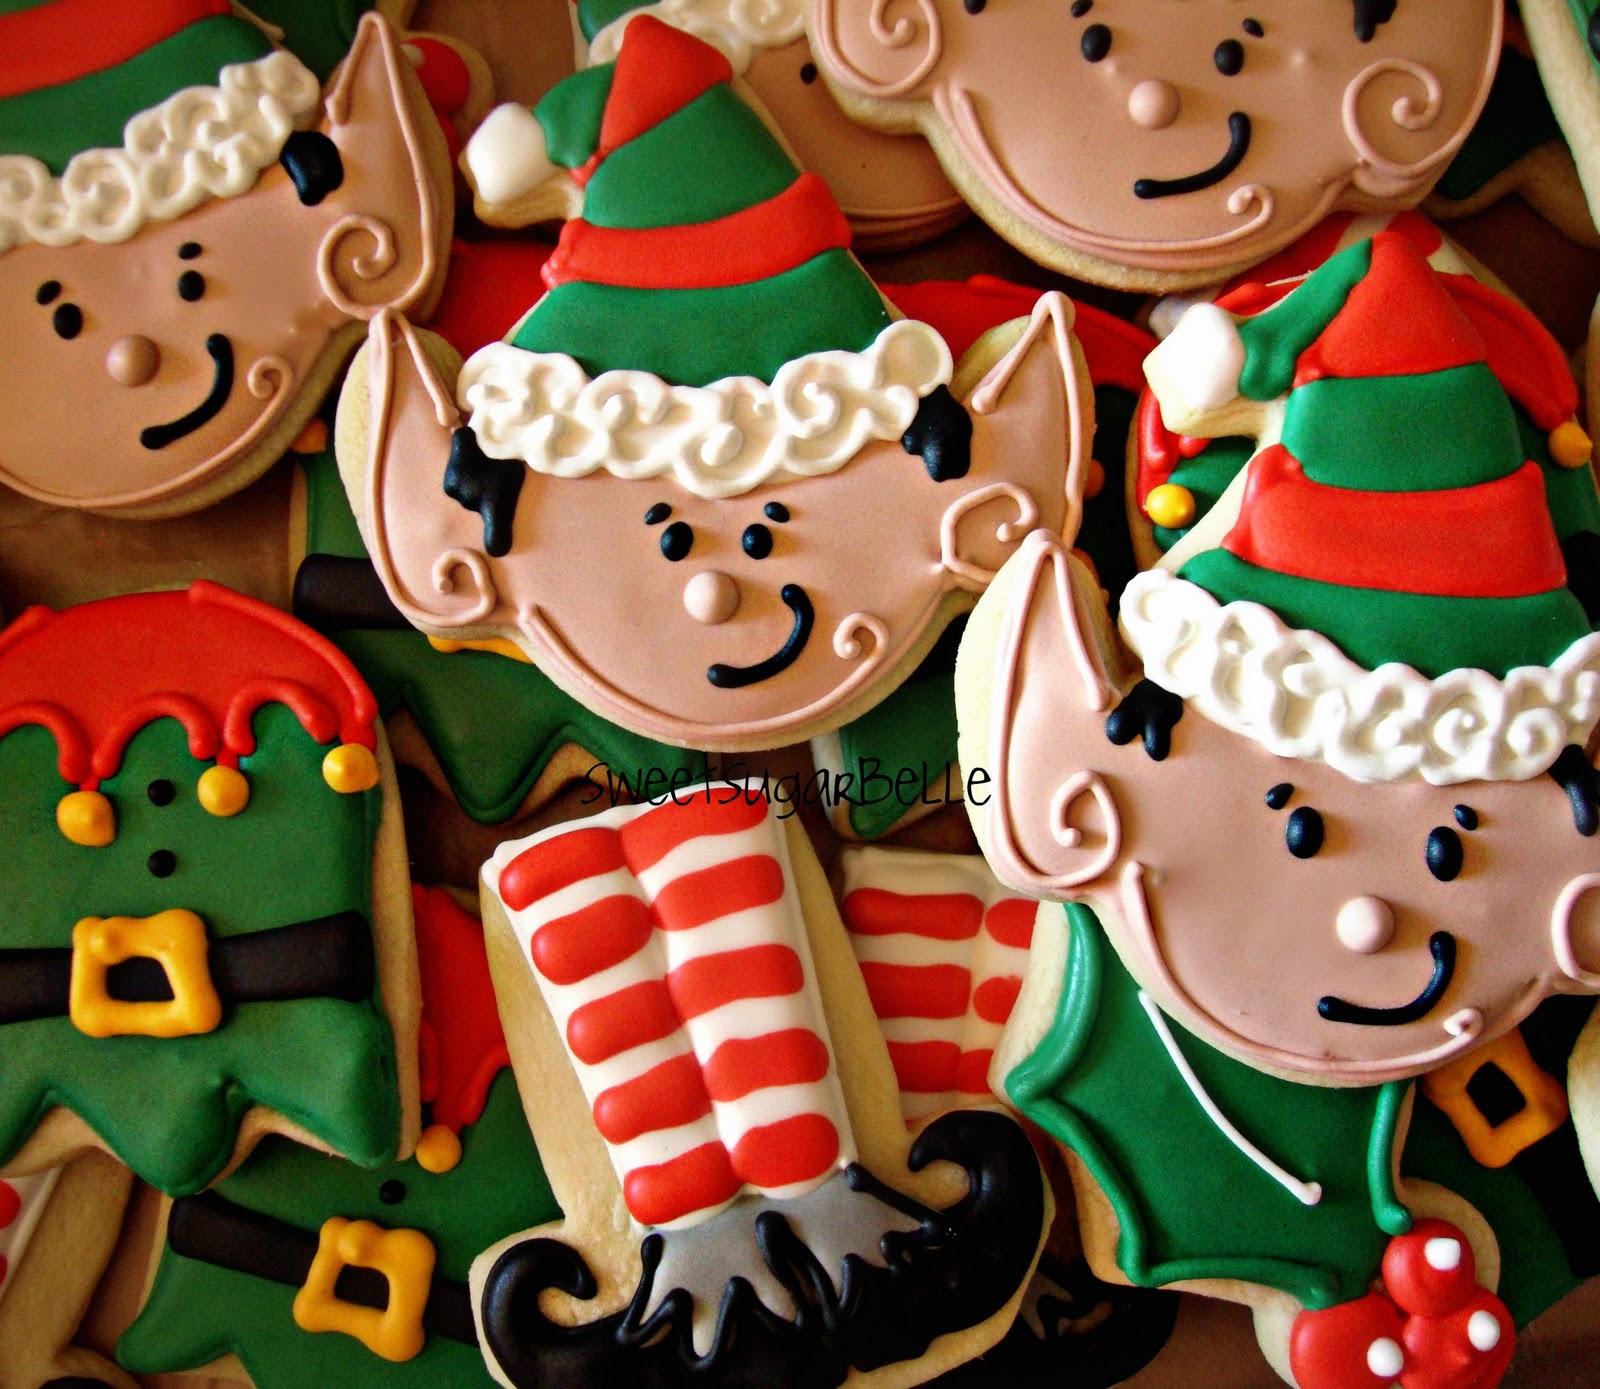 creative christmas cookies using halloween cutters the sweet adventures of sugar belle - Creative Christmas Cookies